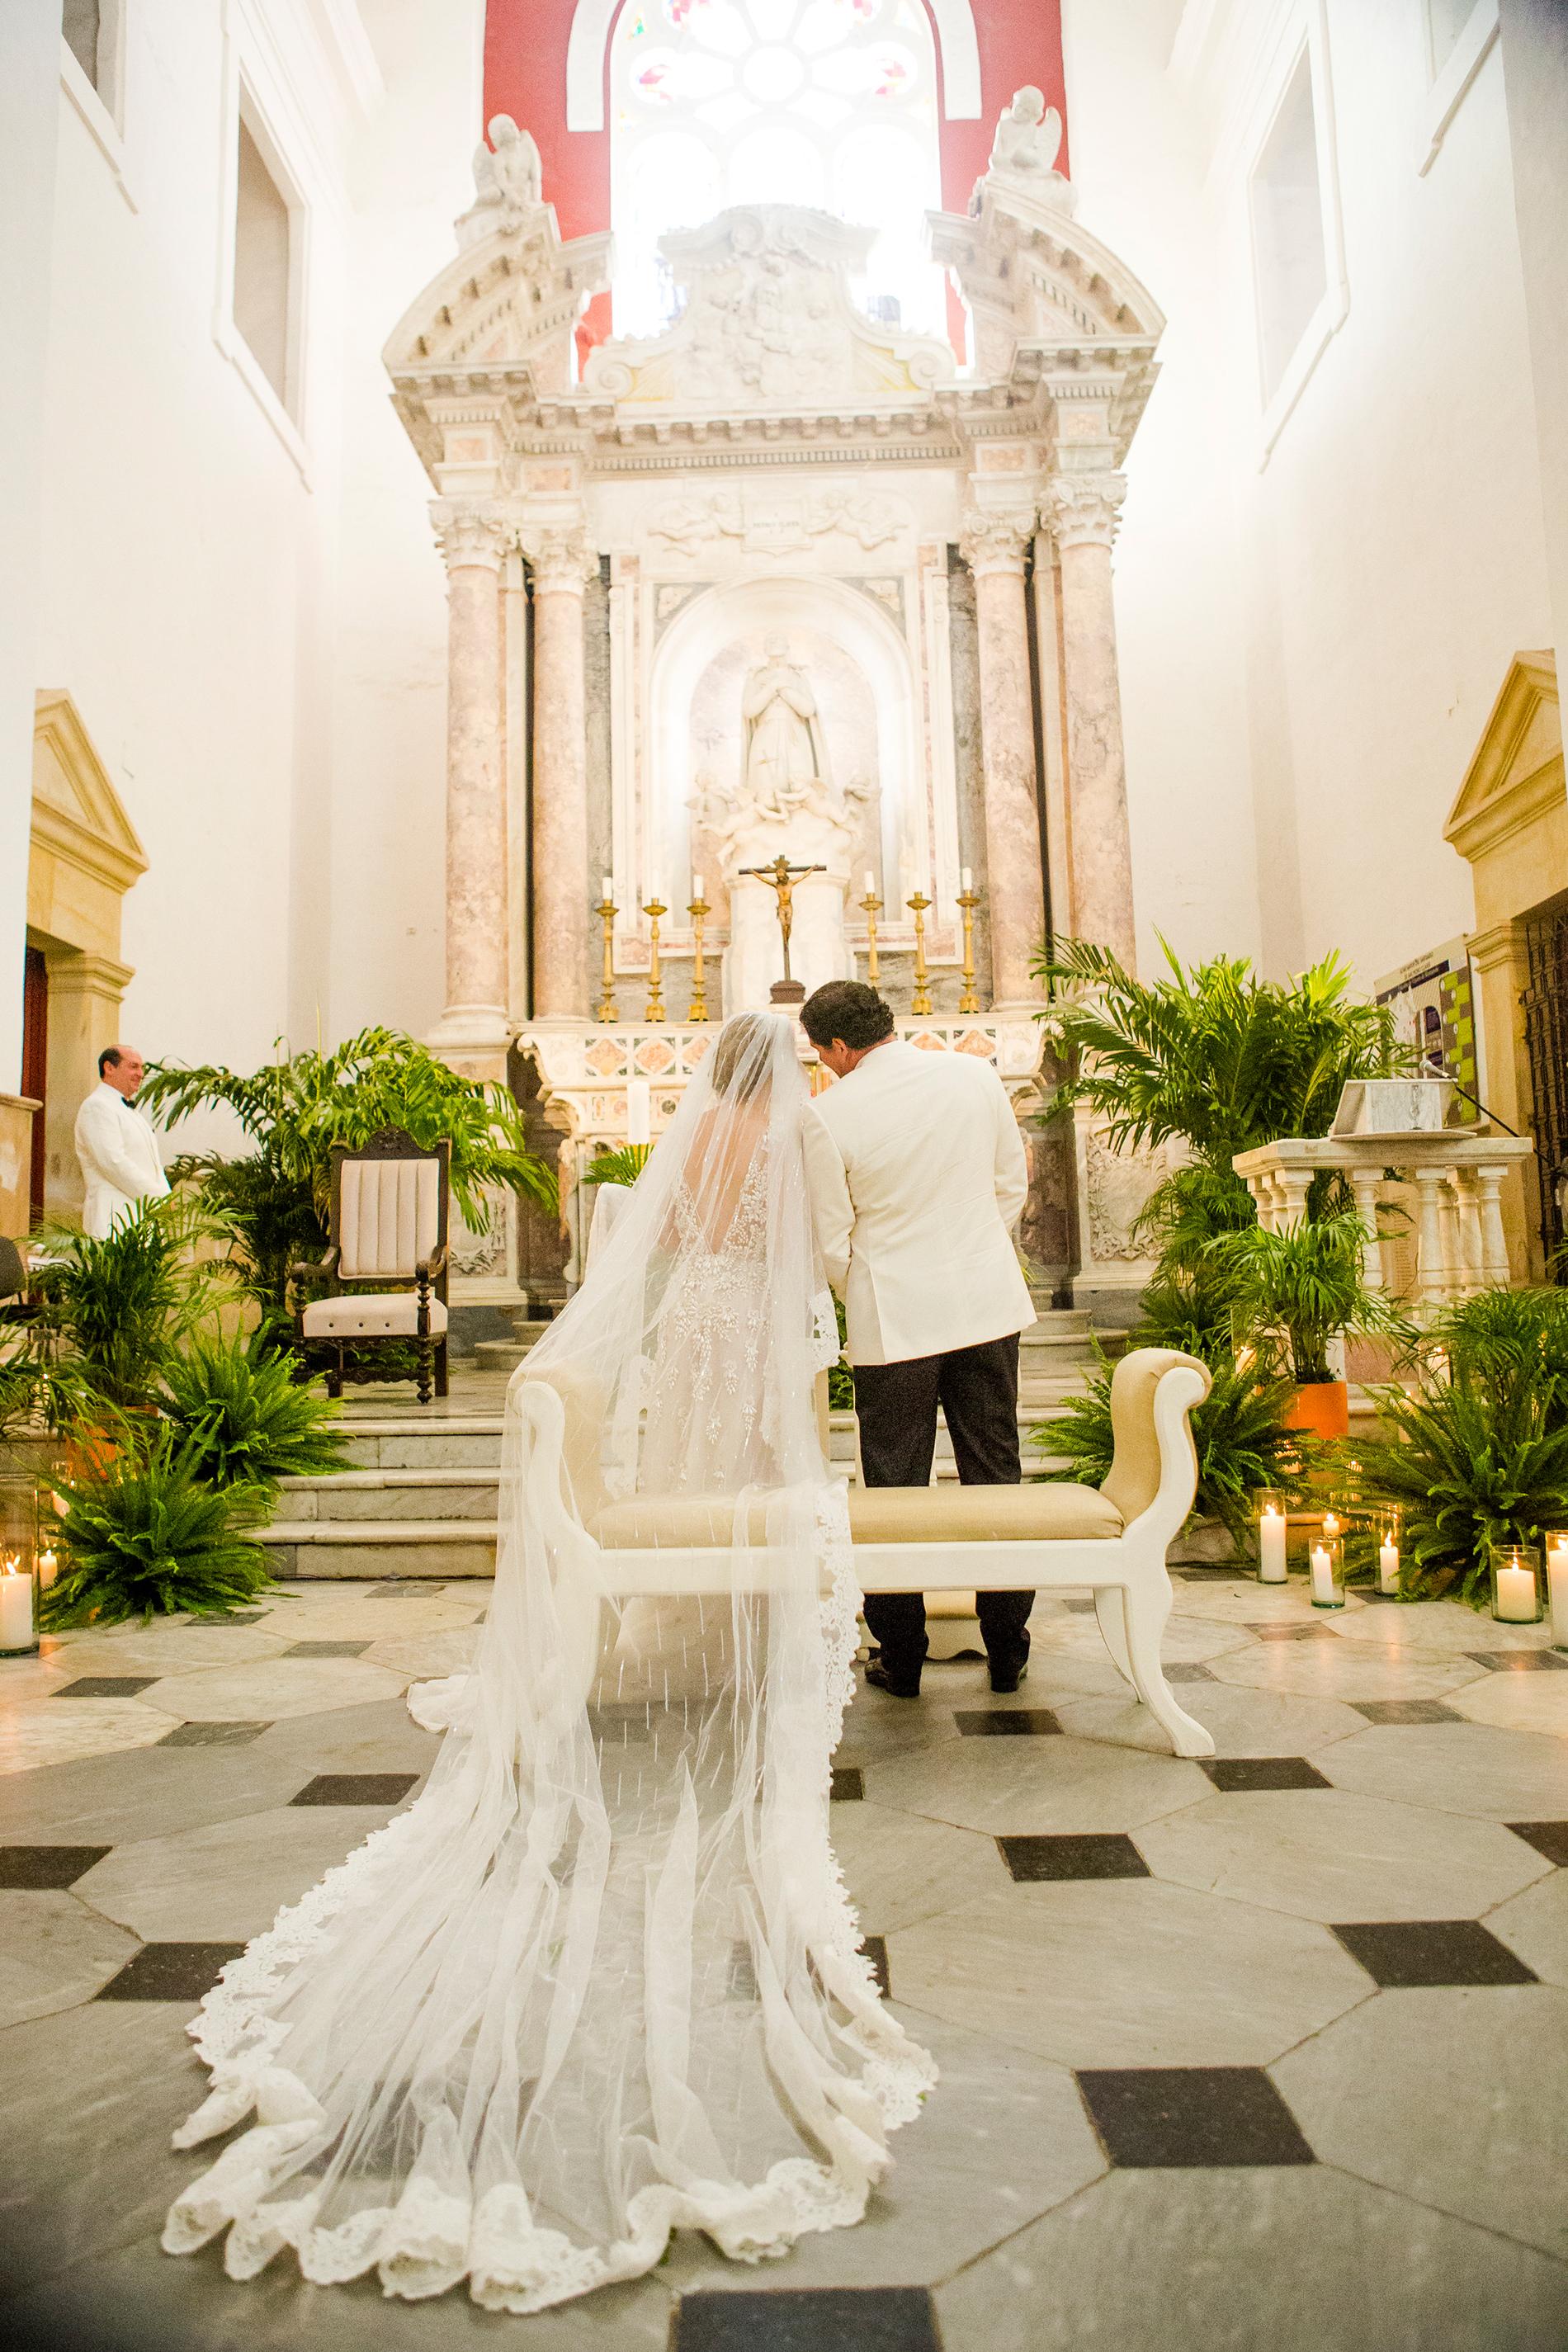 cristina andre wedding ceremony